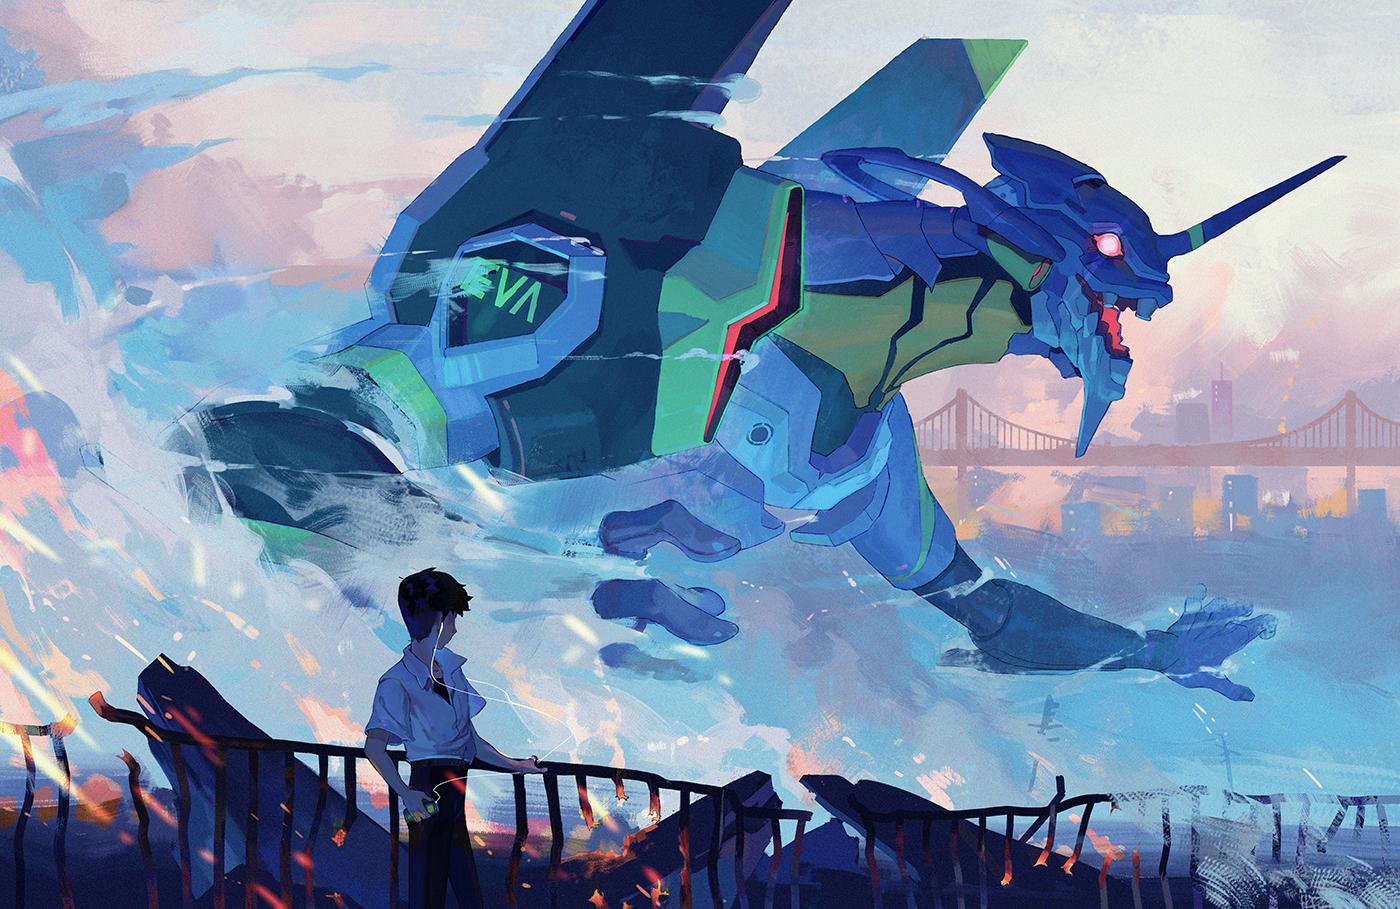 Wallpaper Neon Genesis Evangelion Mech Eva Unit 01 Ikari Shinji 1400x909 Jt42 1622285 Hd Wallpapers Wallhere